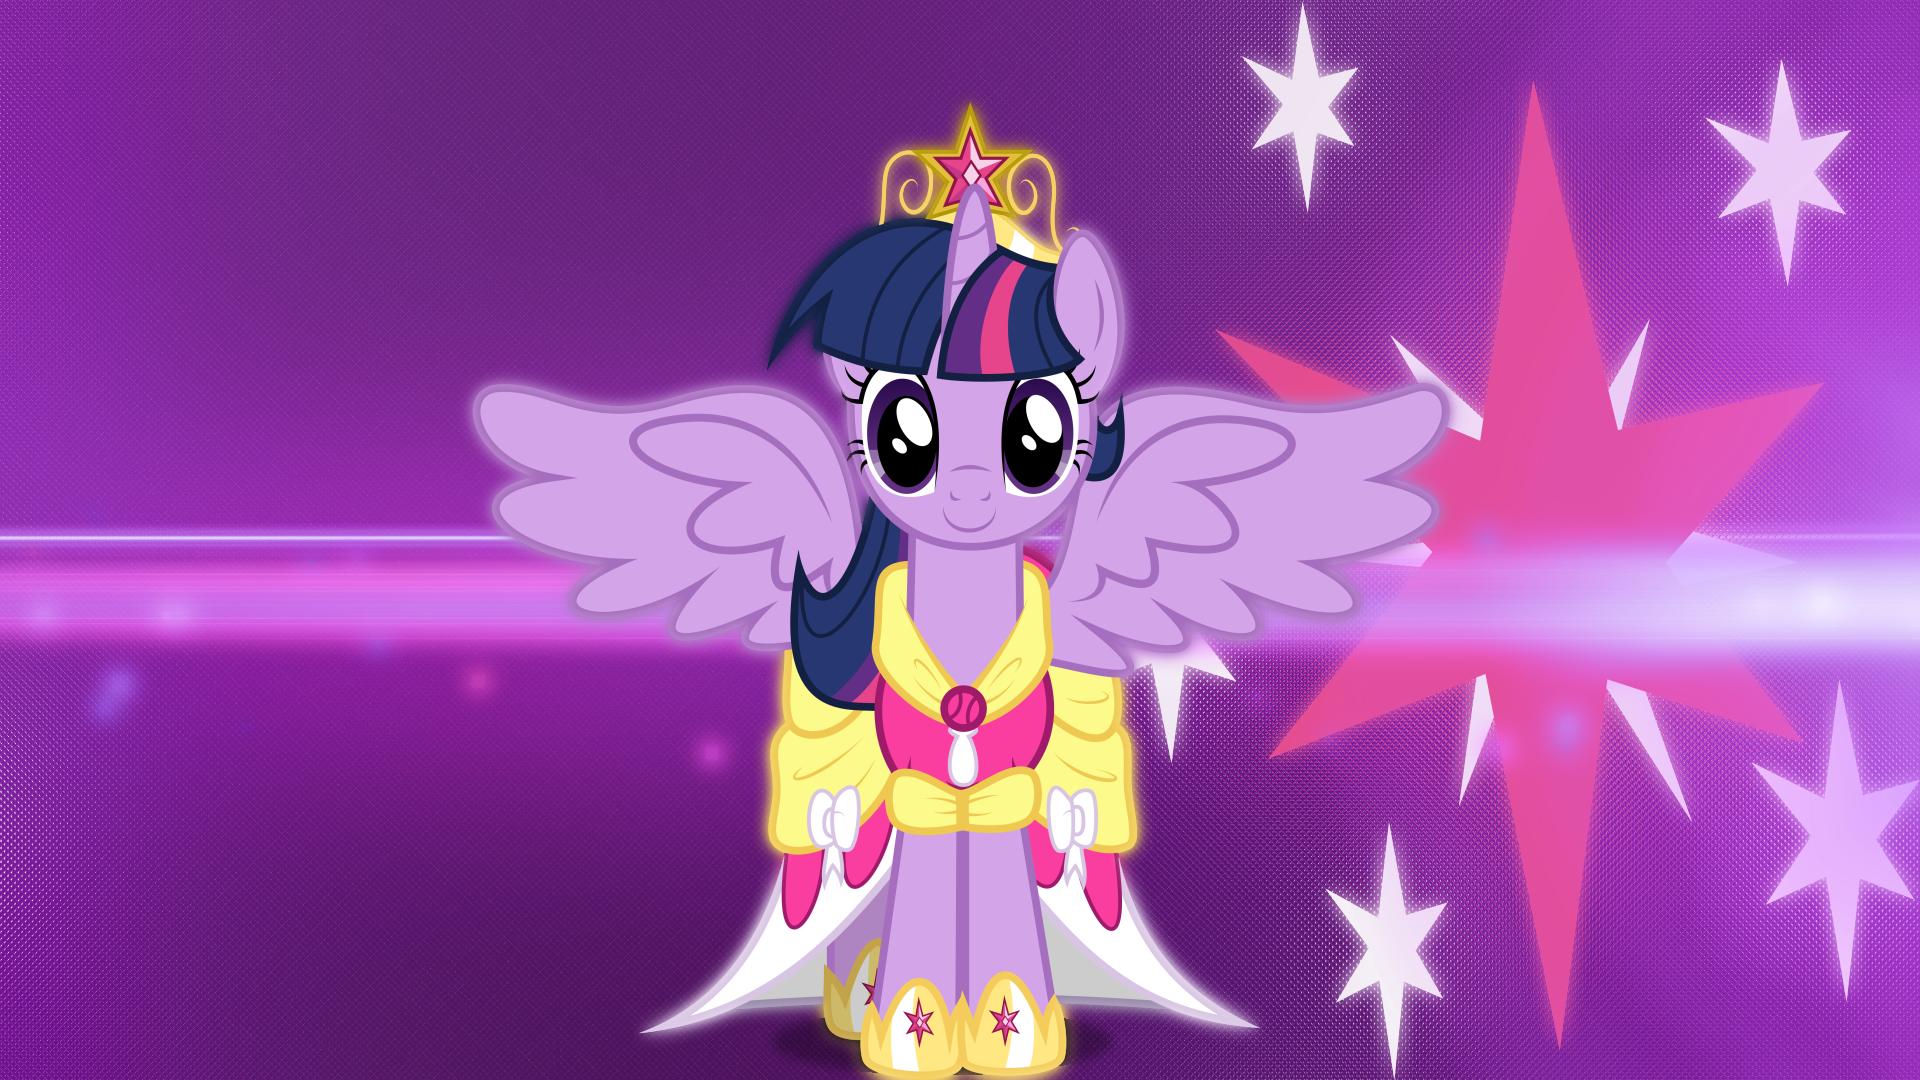 princess twilight sparkle wallpaper cool - photo #1